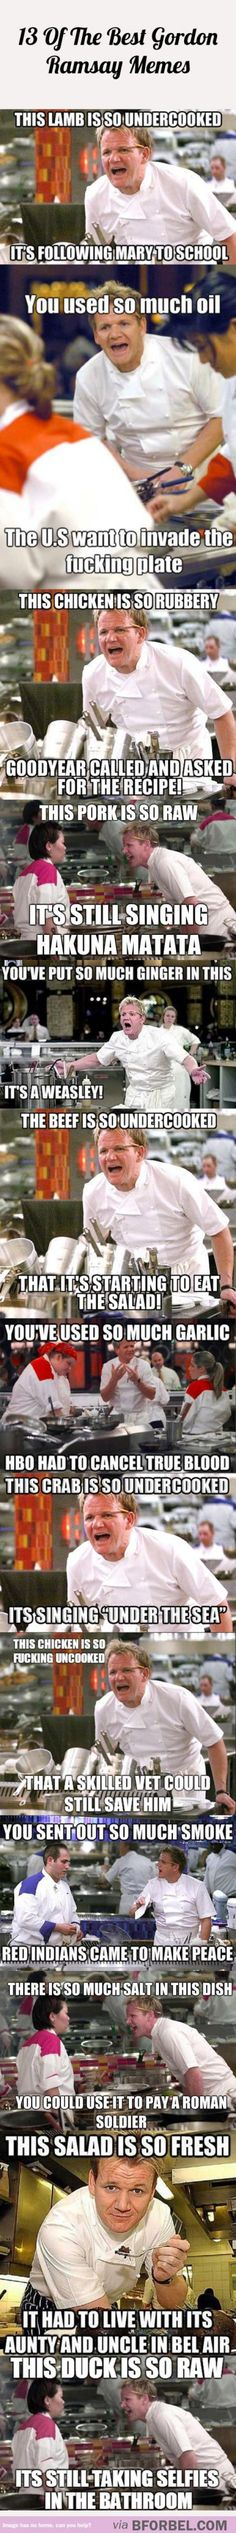 13 Best Gordon Ramsey Memes